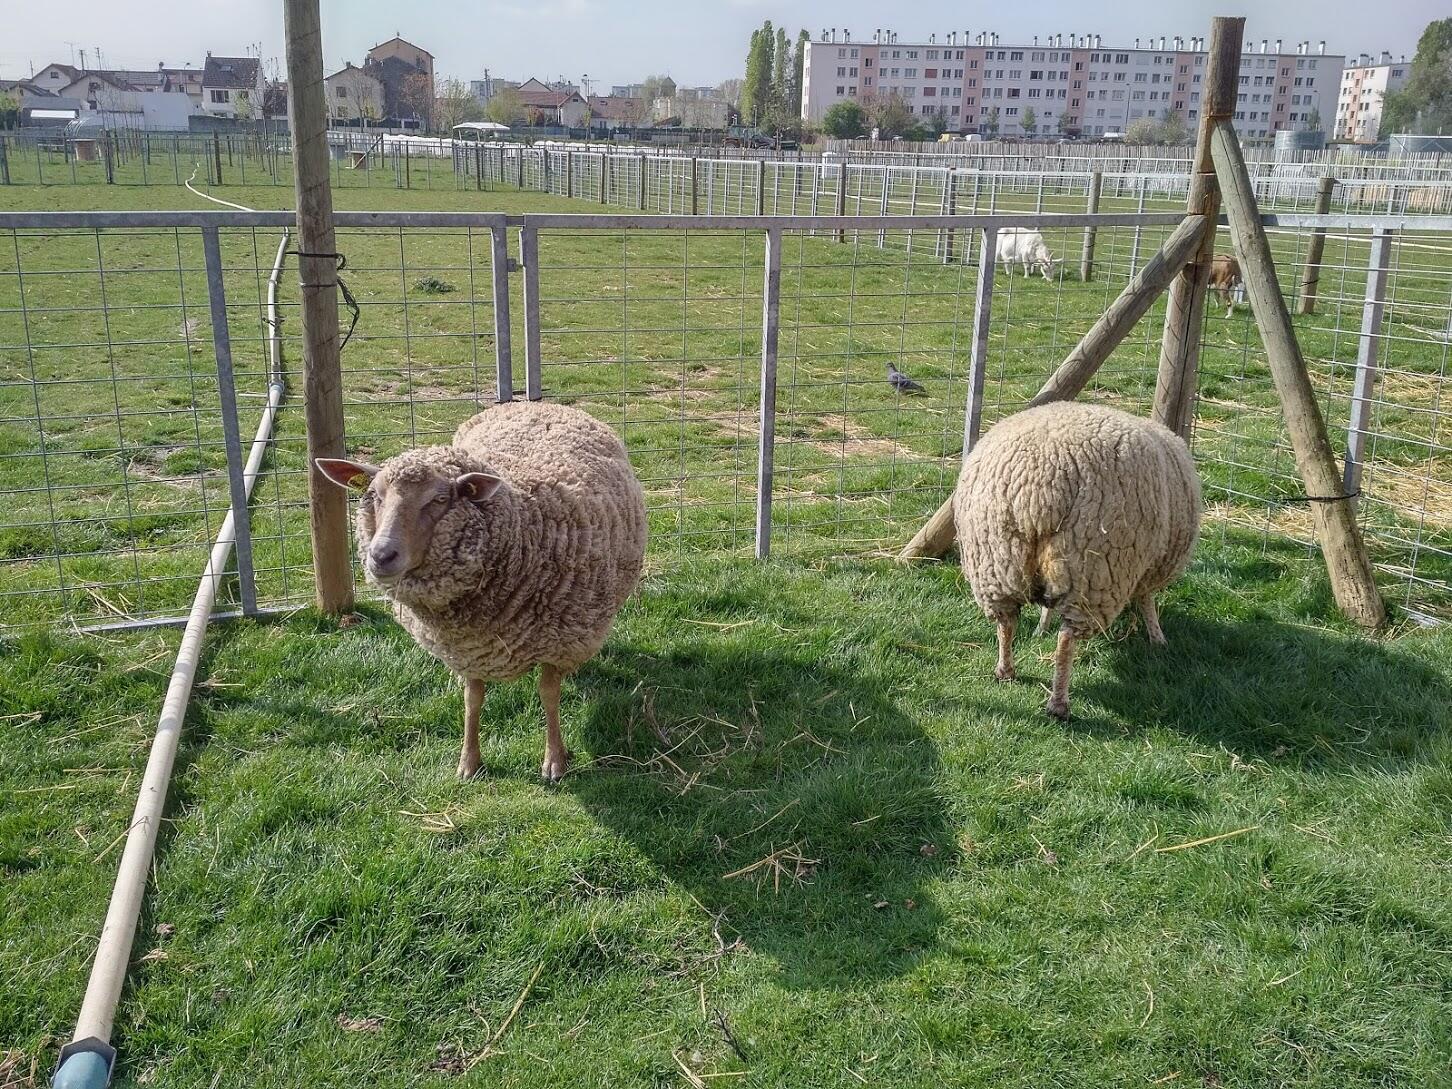 Cada oveja tiene su nombre de pila.